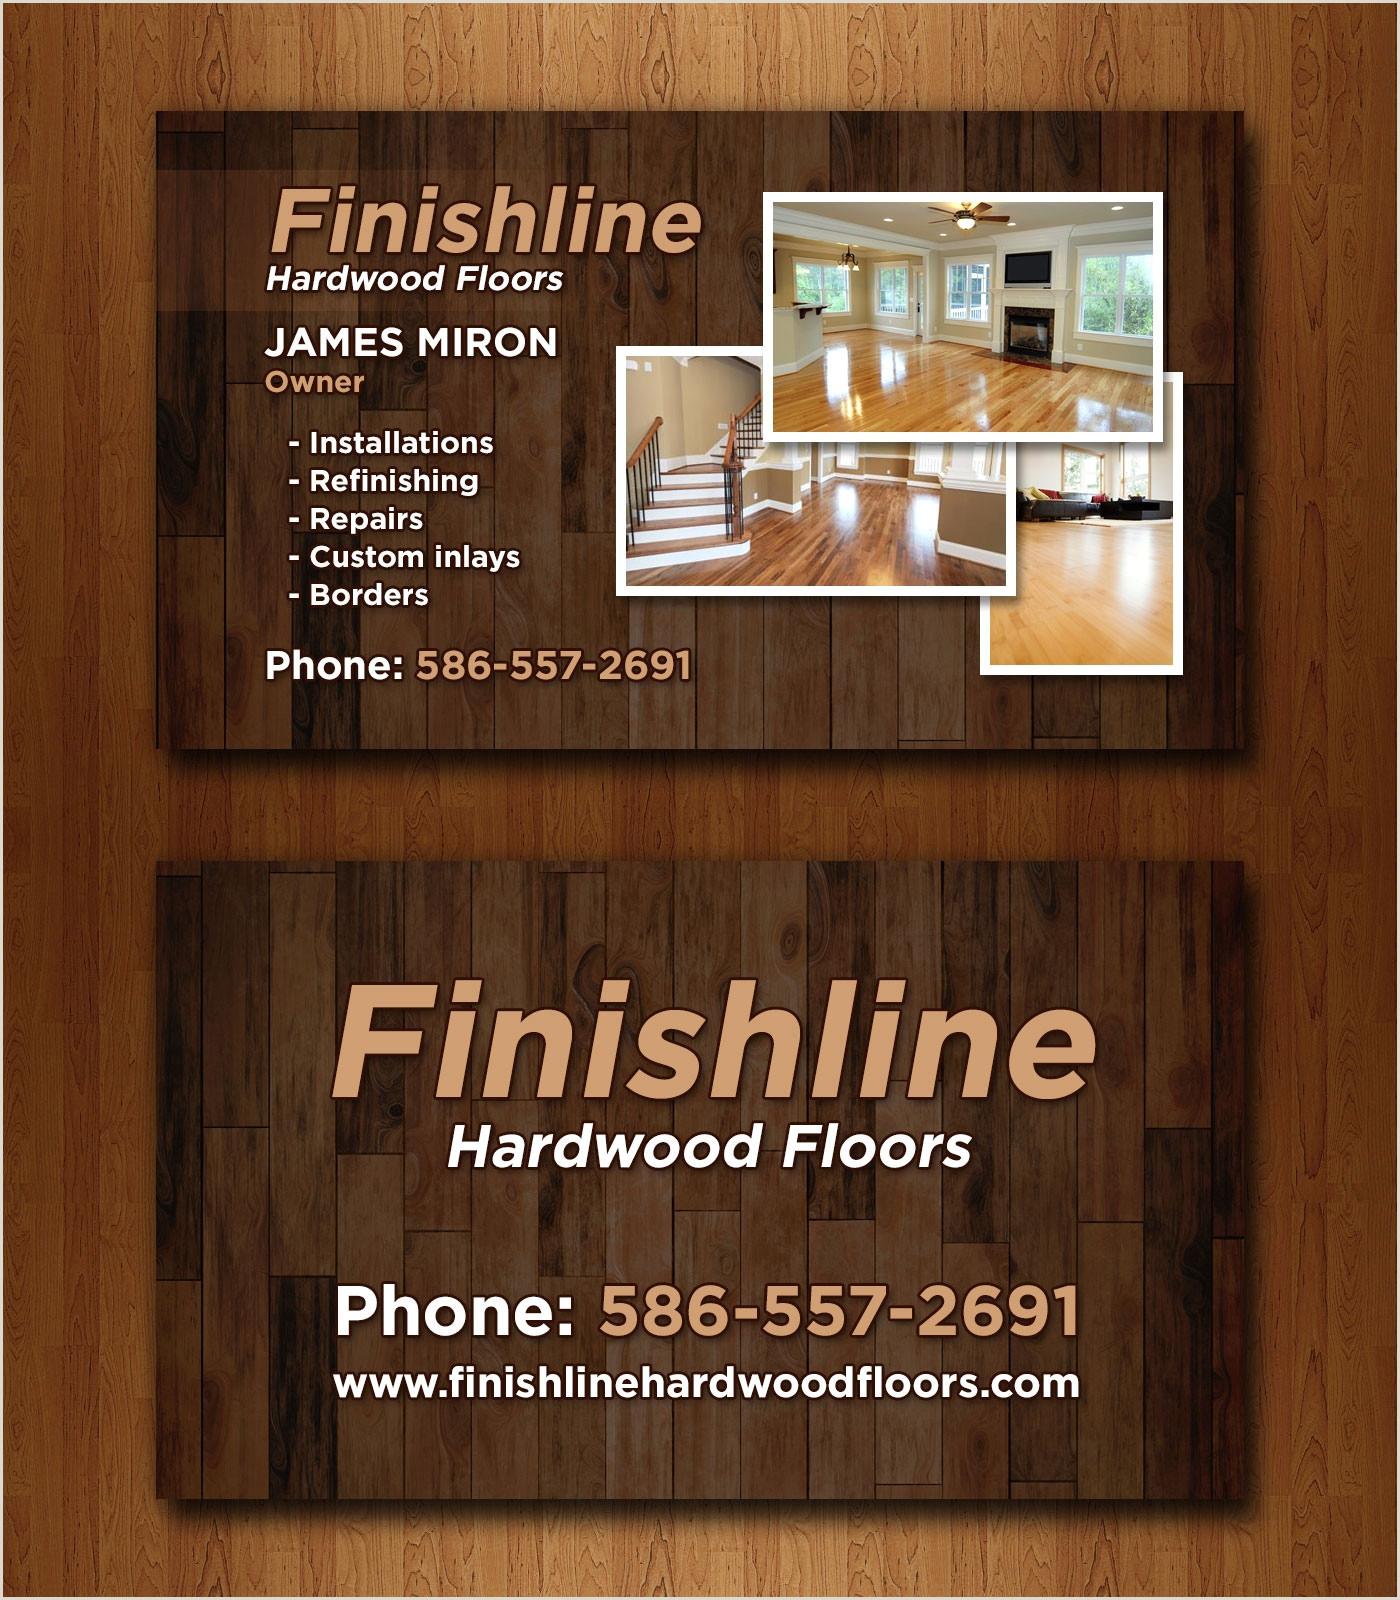 Sample Business Cards Templates 14 Popular Hardwood Flooring Business Card Template